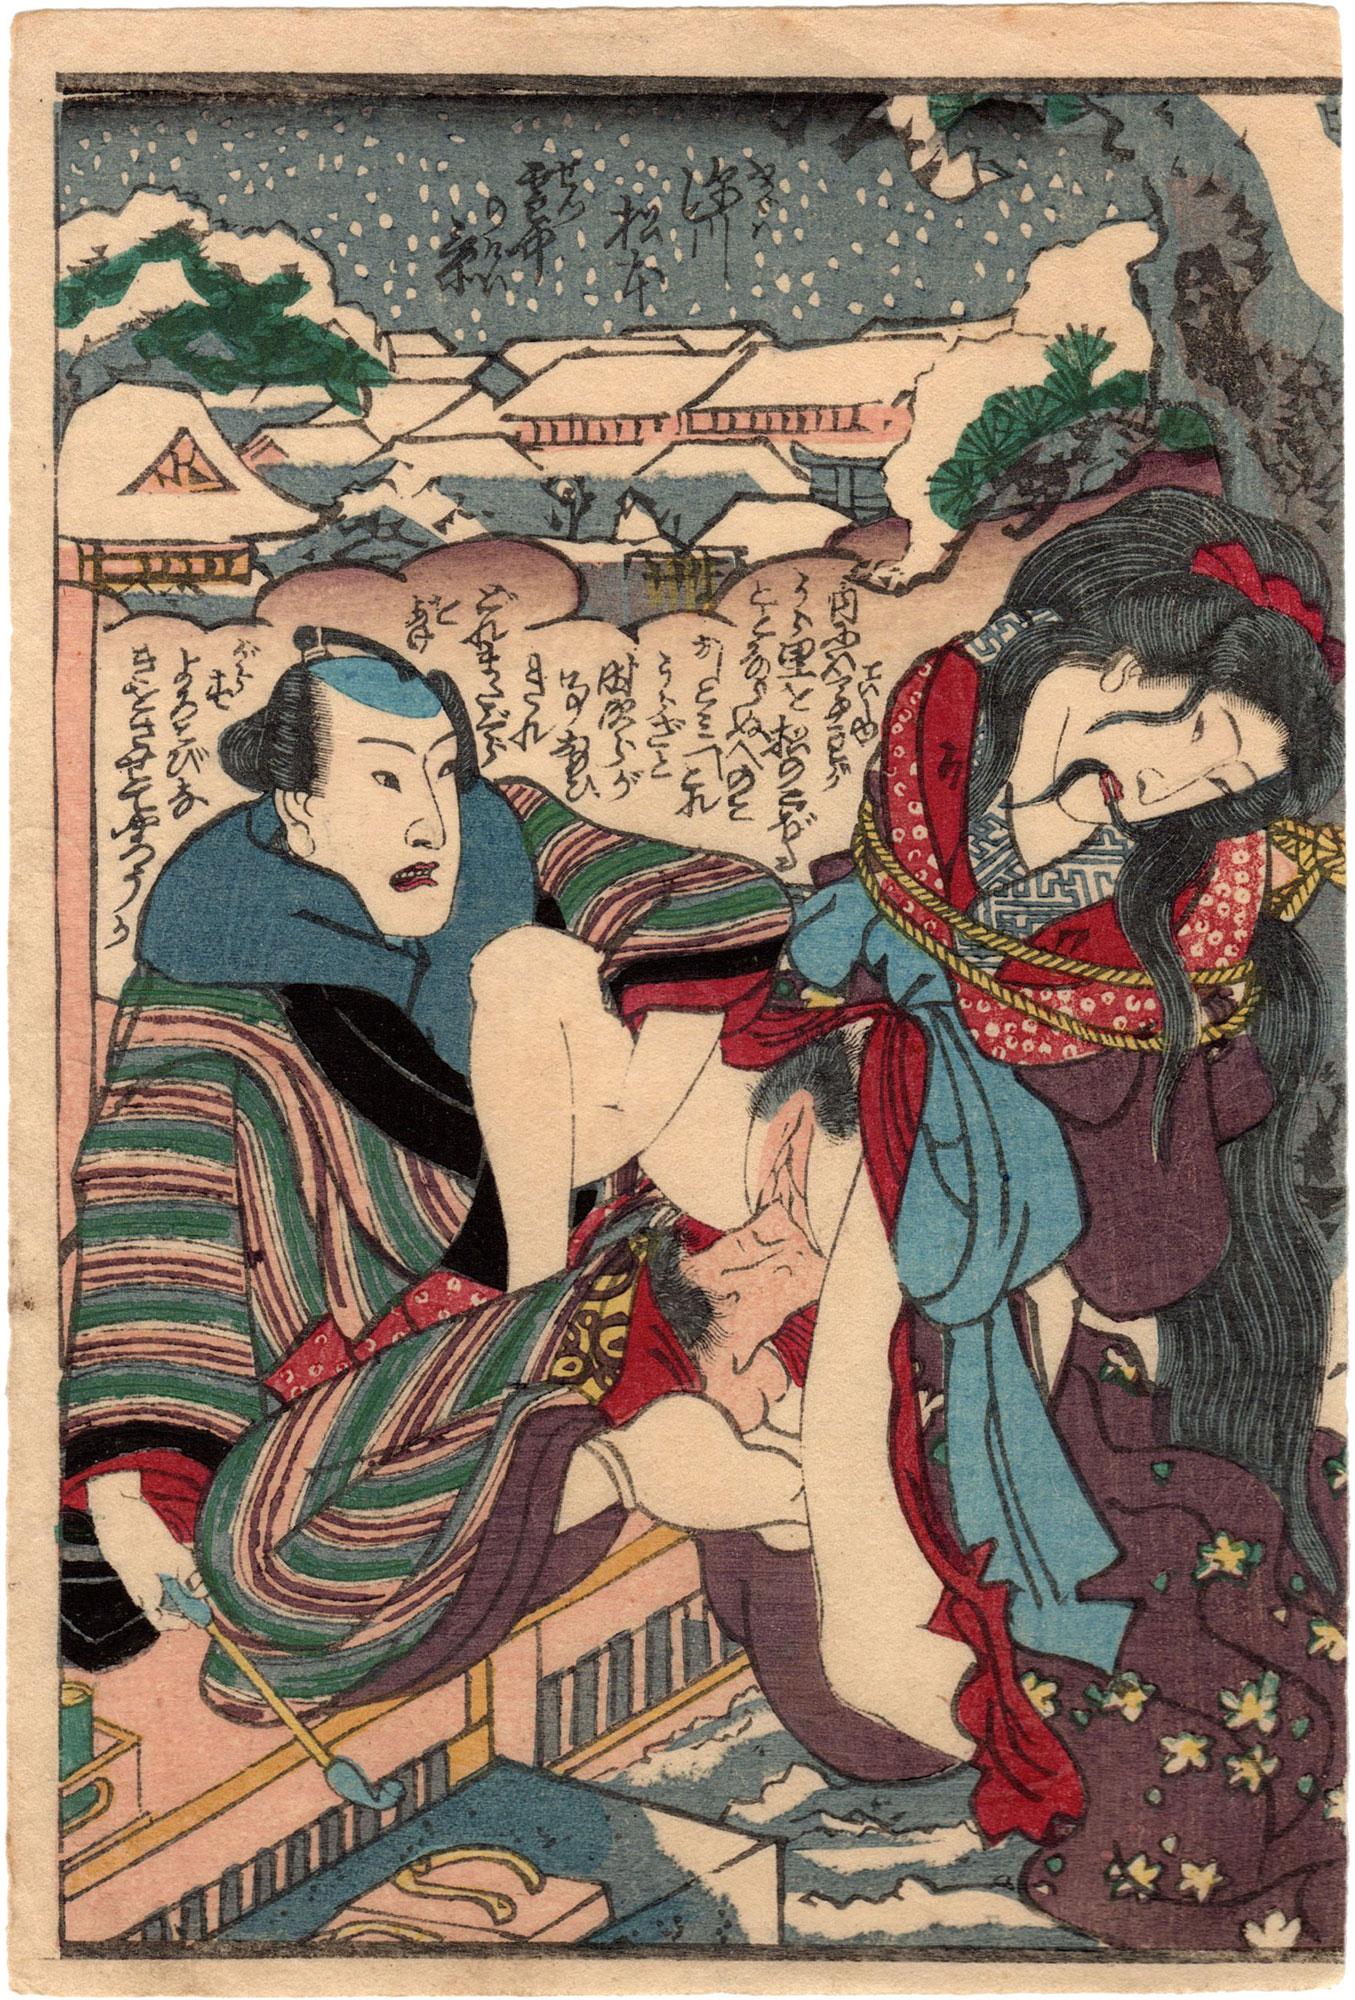 FUKAGAWA (Toyohara Kunichika)